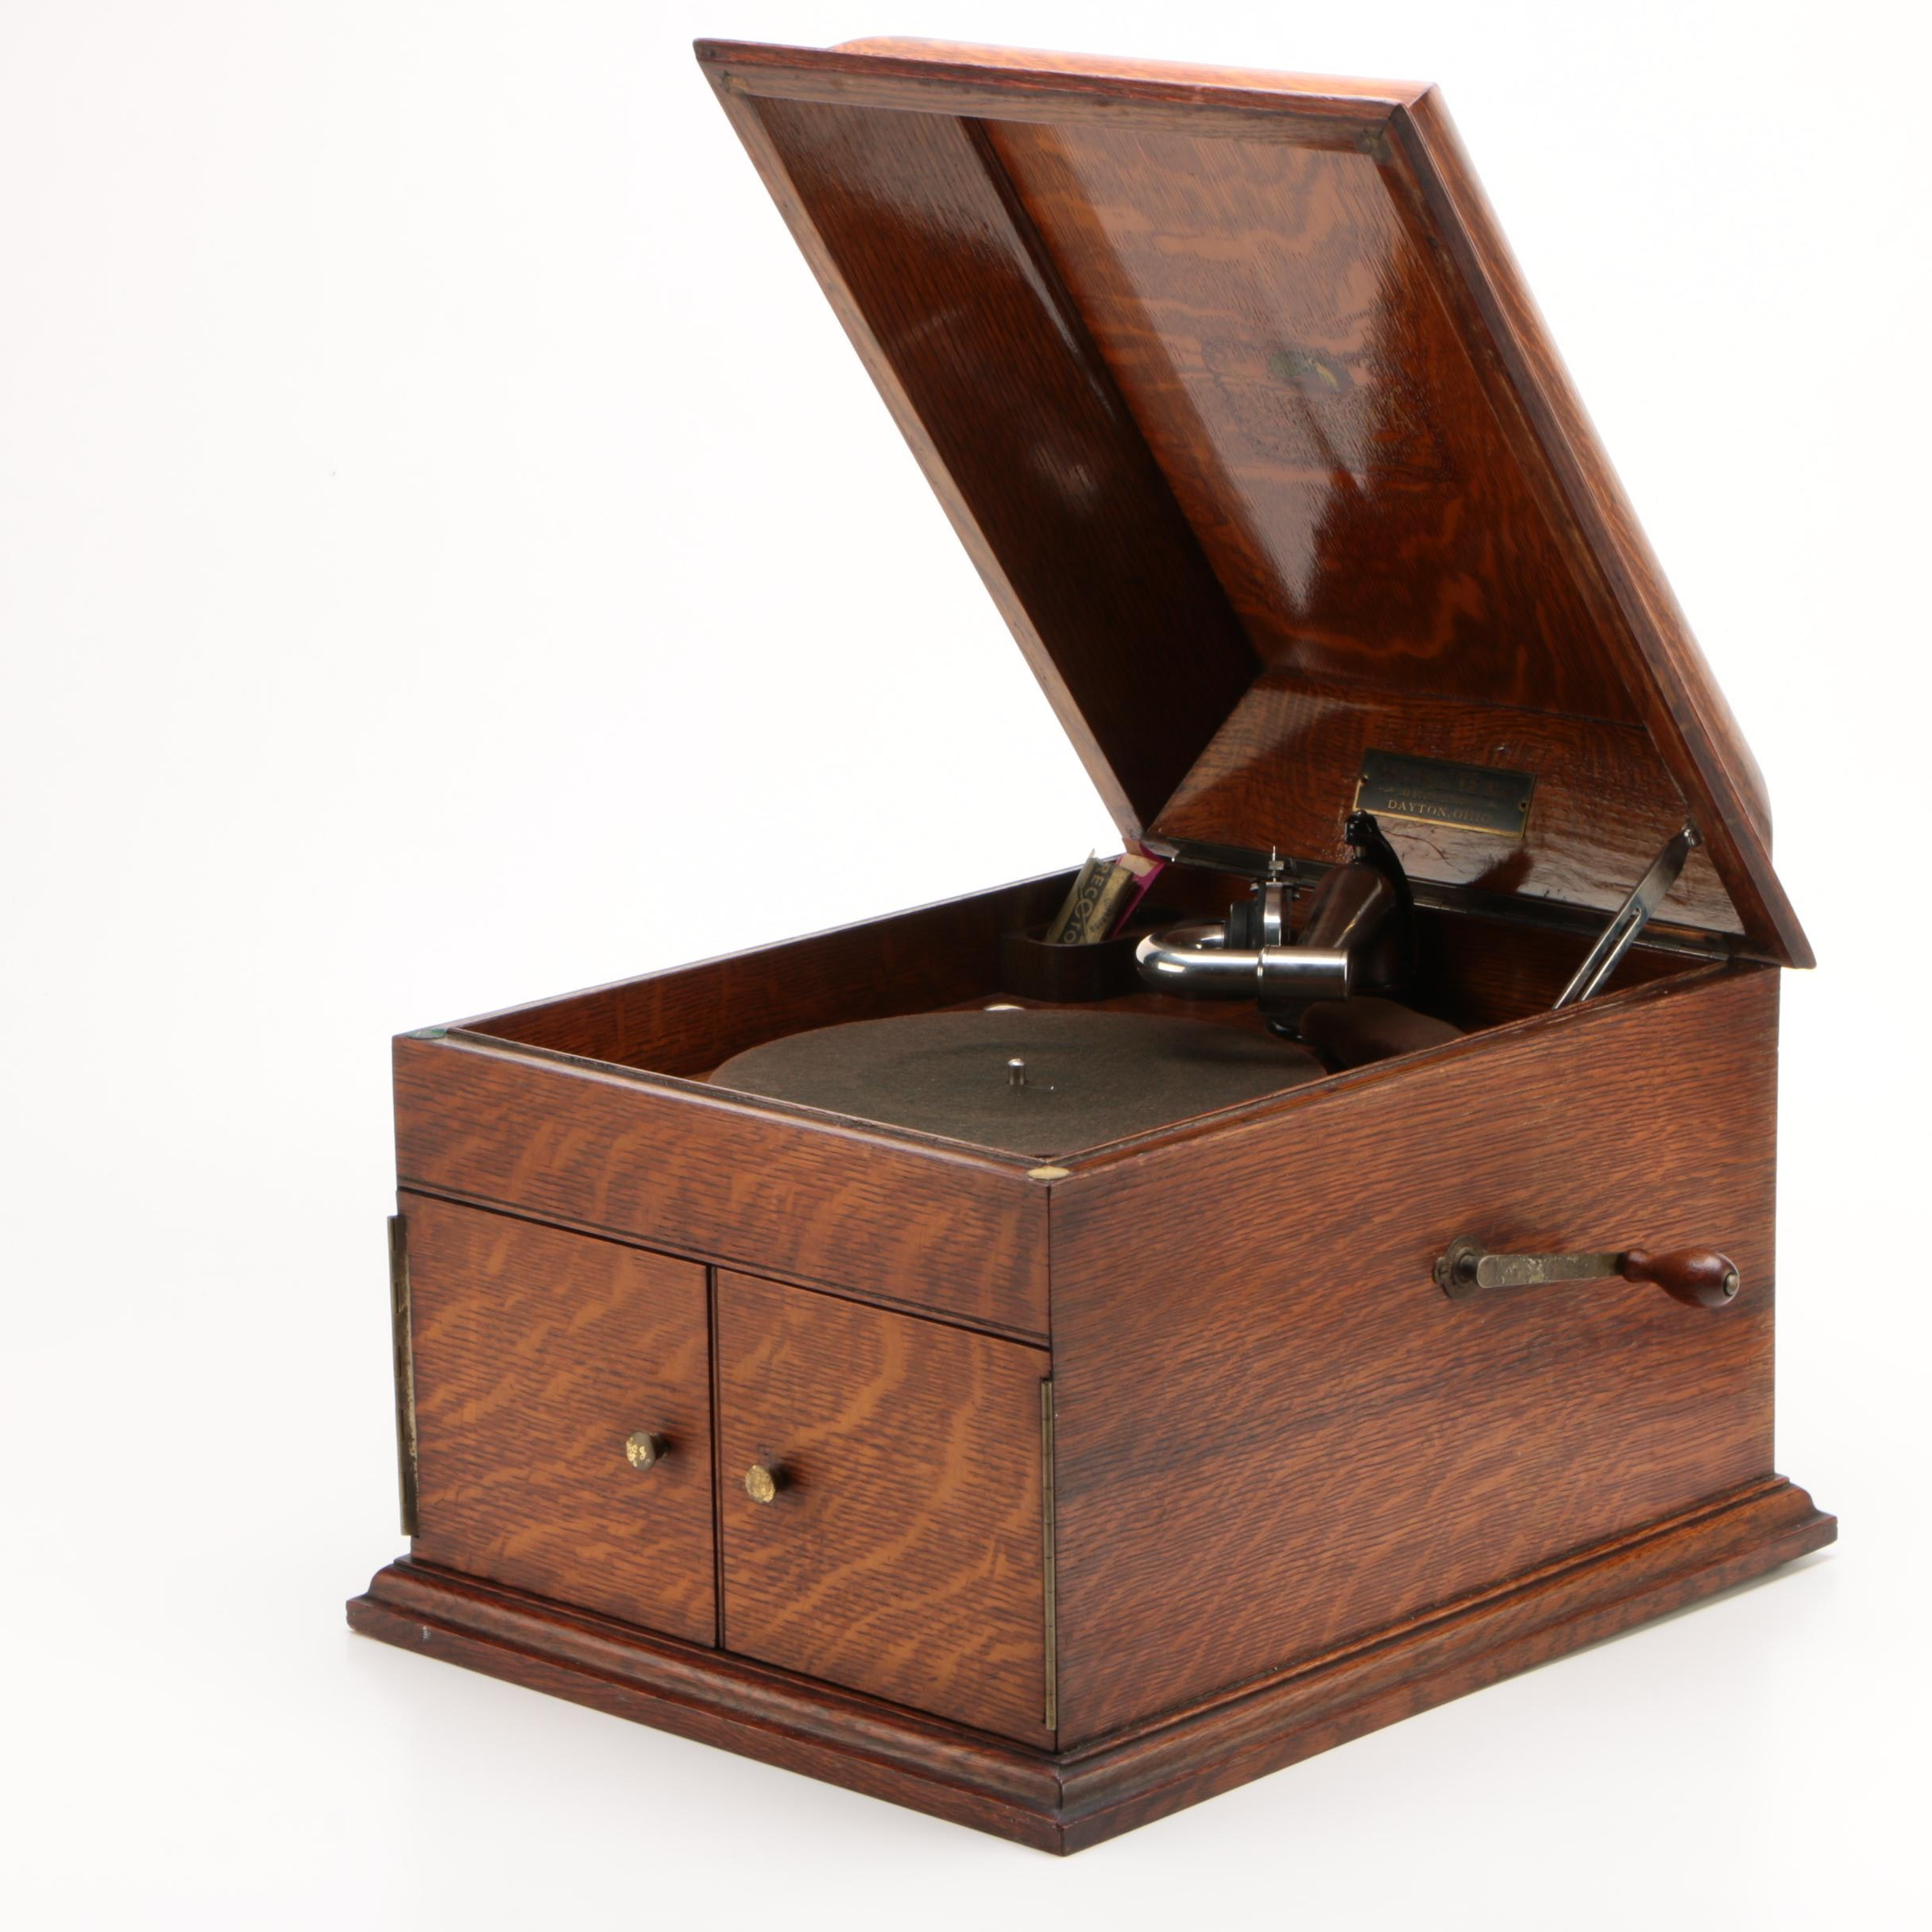 Victor-Victrola VV-VIII Oak Tabletop Record Player, 1911